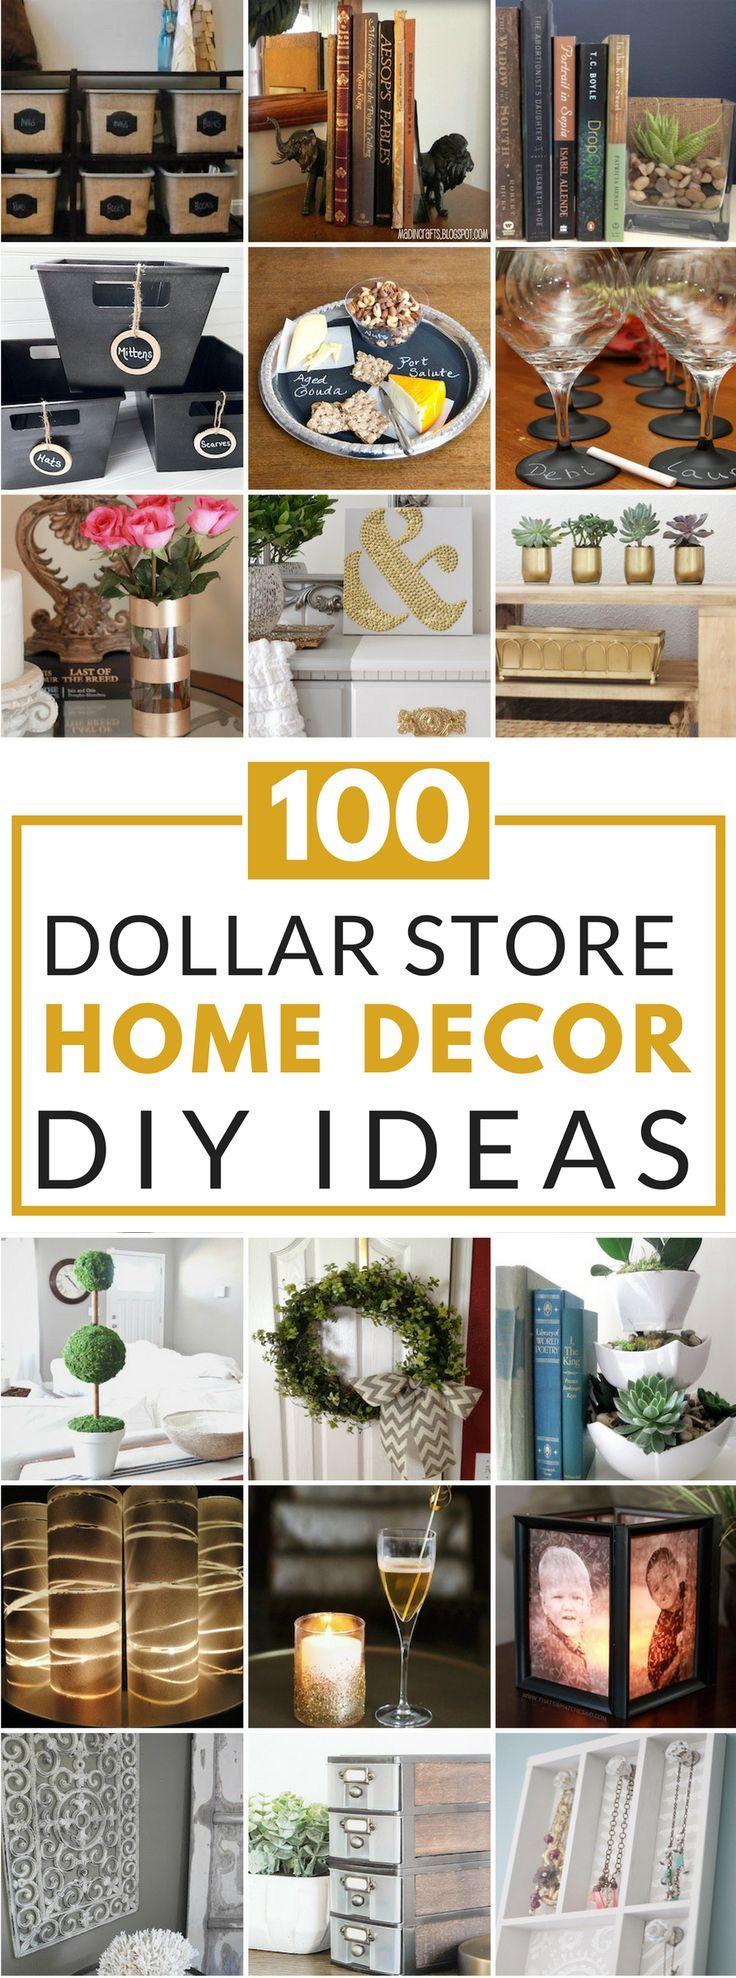 Scrapbook paper dollar general - 100 Dollar Store Diy Home Decor Ideas